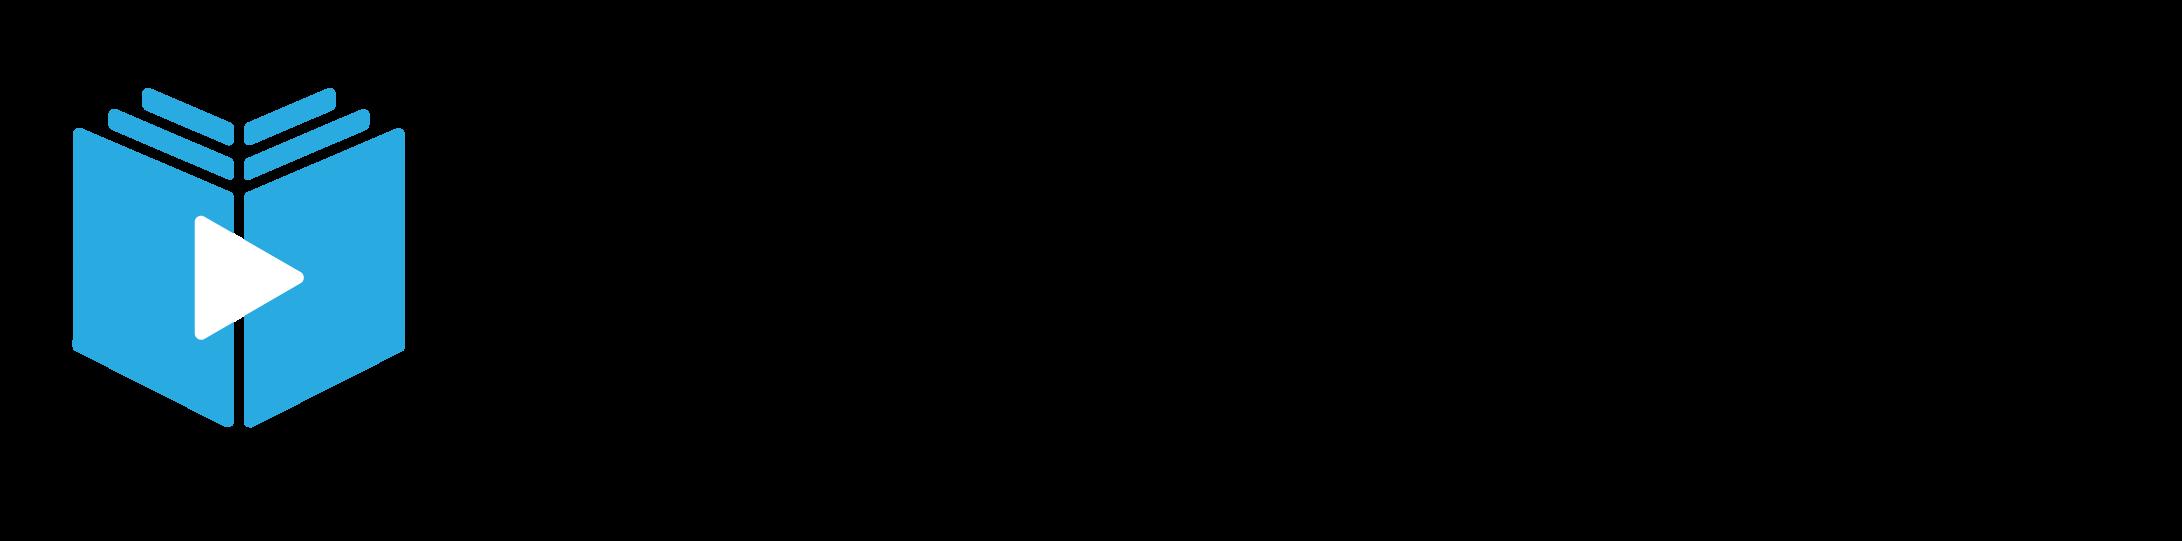 teachmint color logo